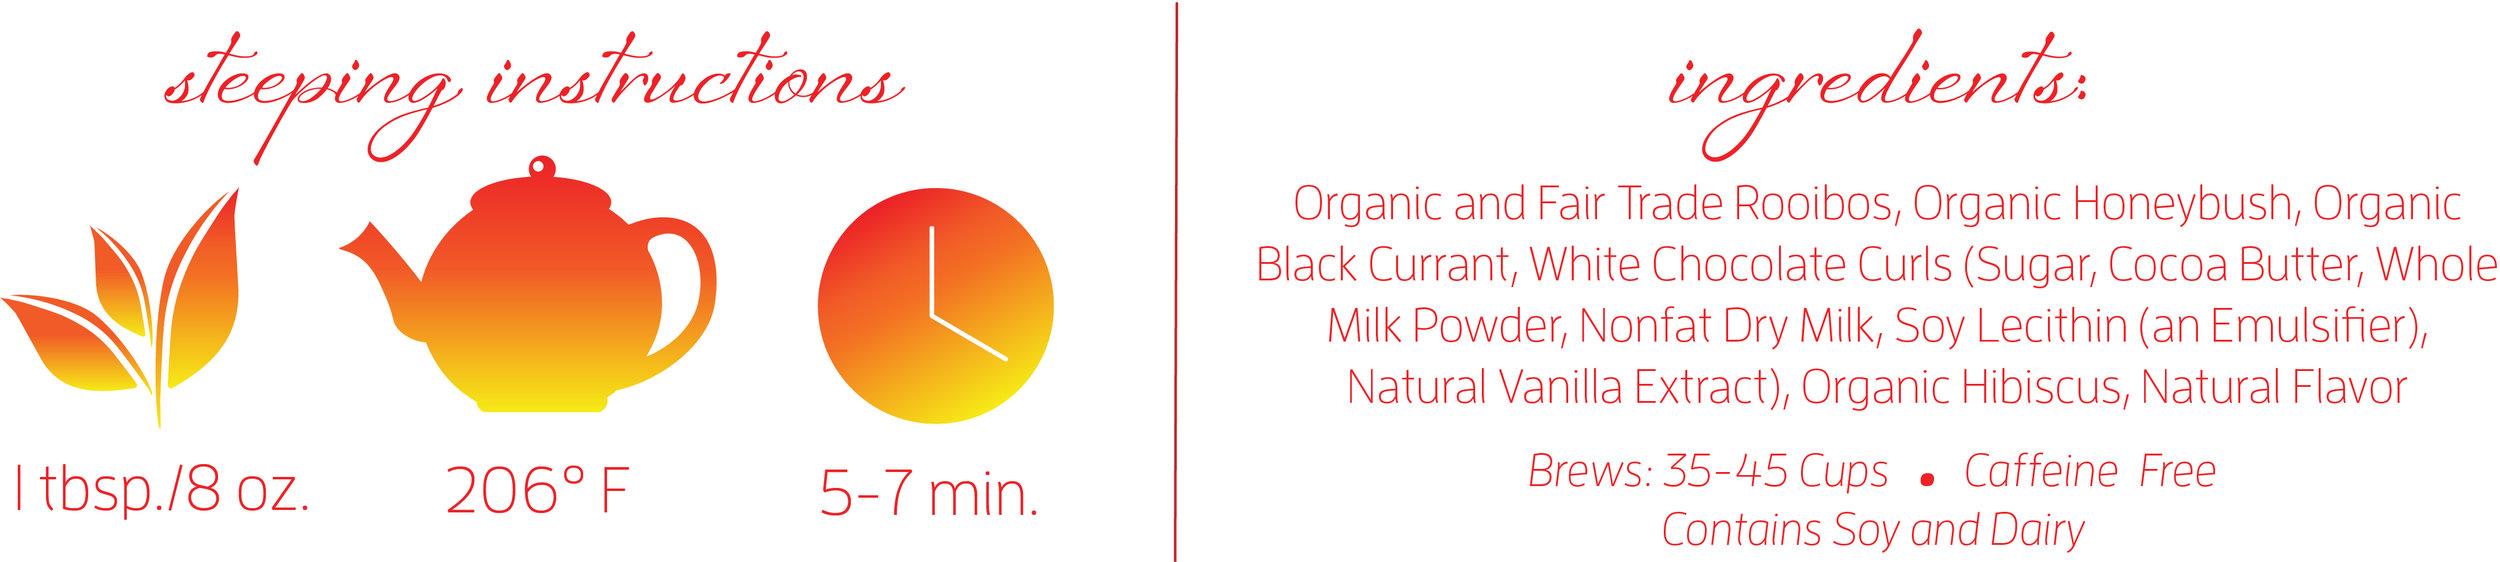 Very Berry White Chocolate Website Content.jpg